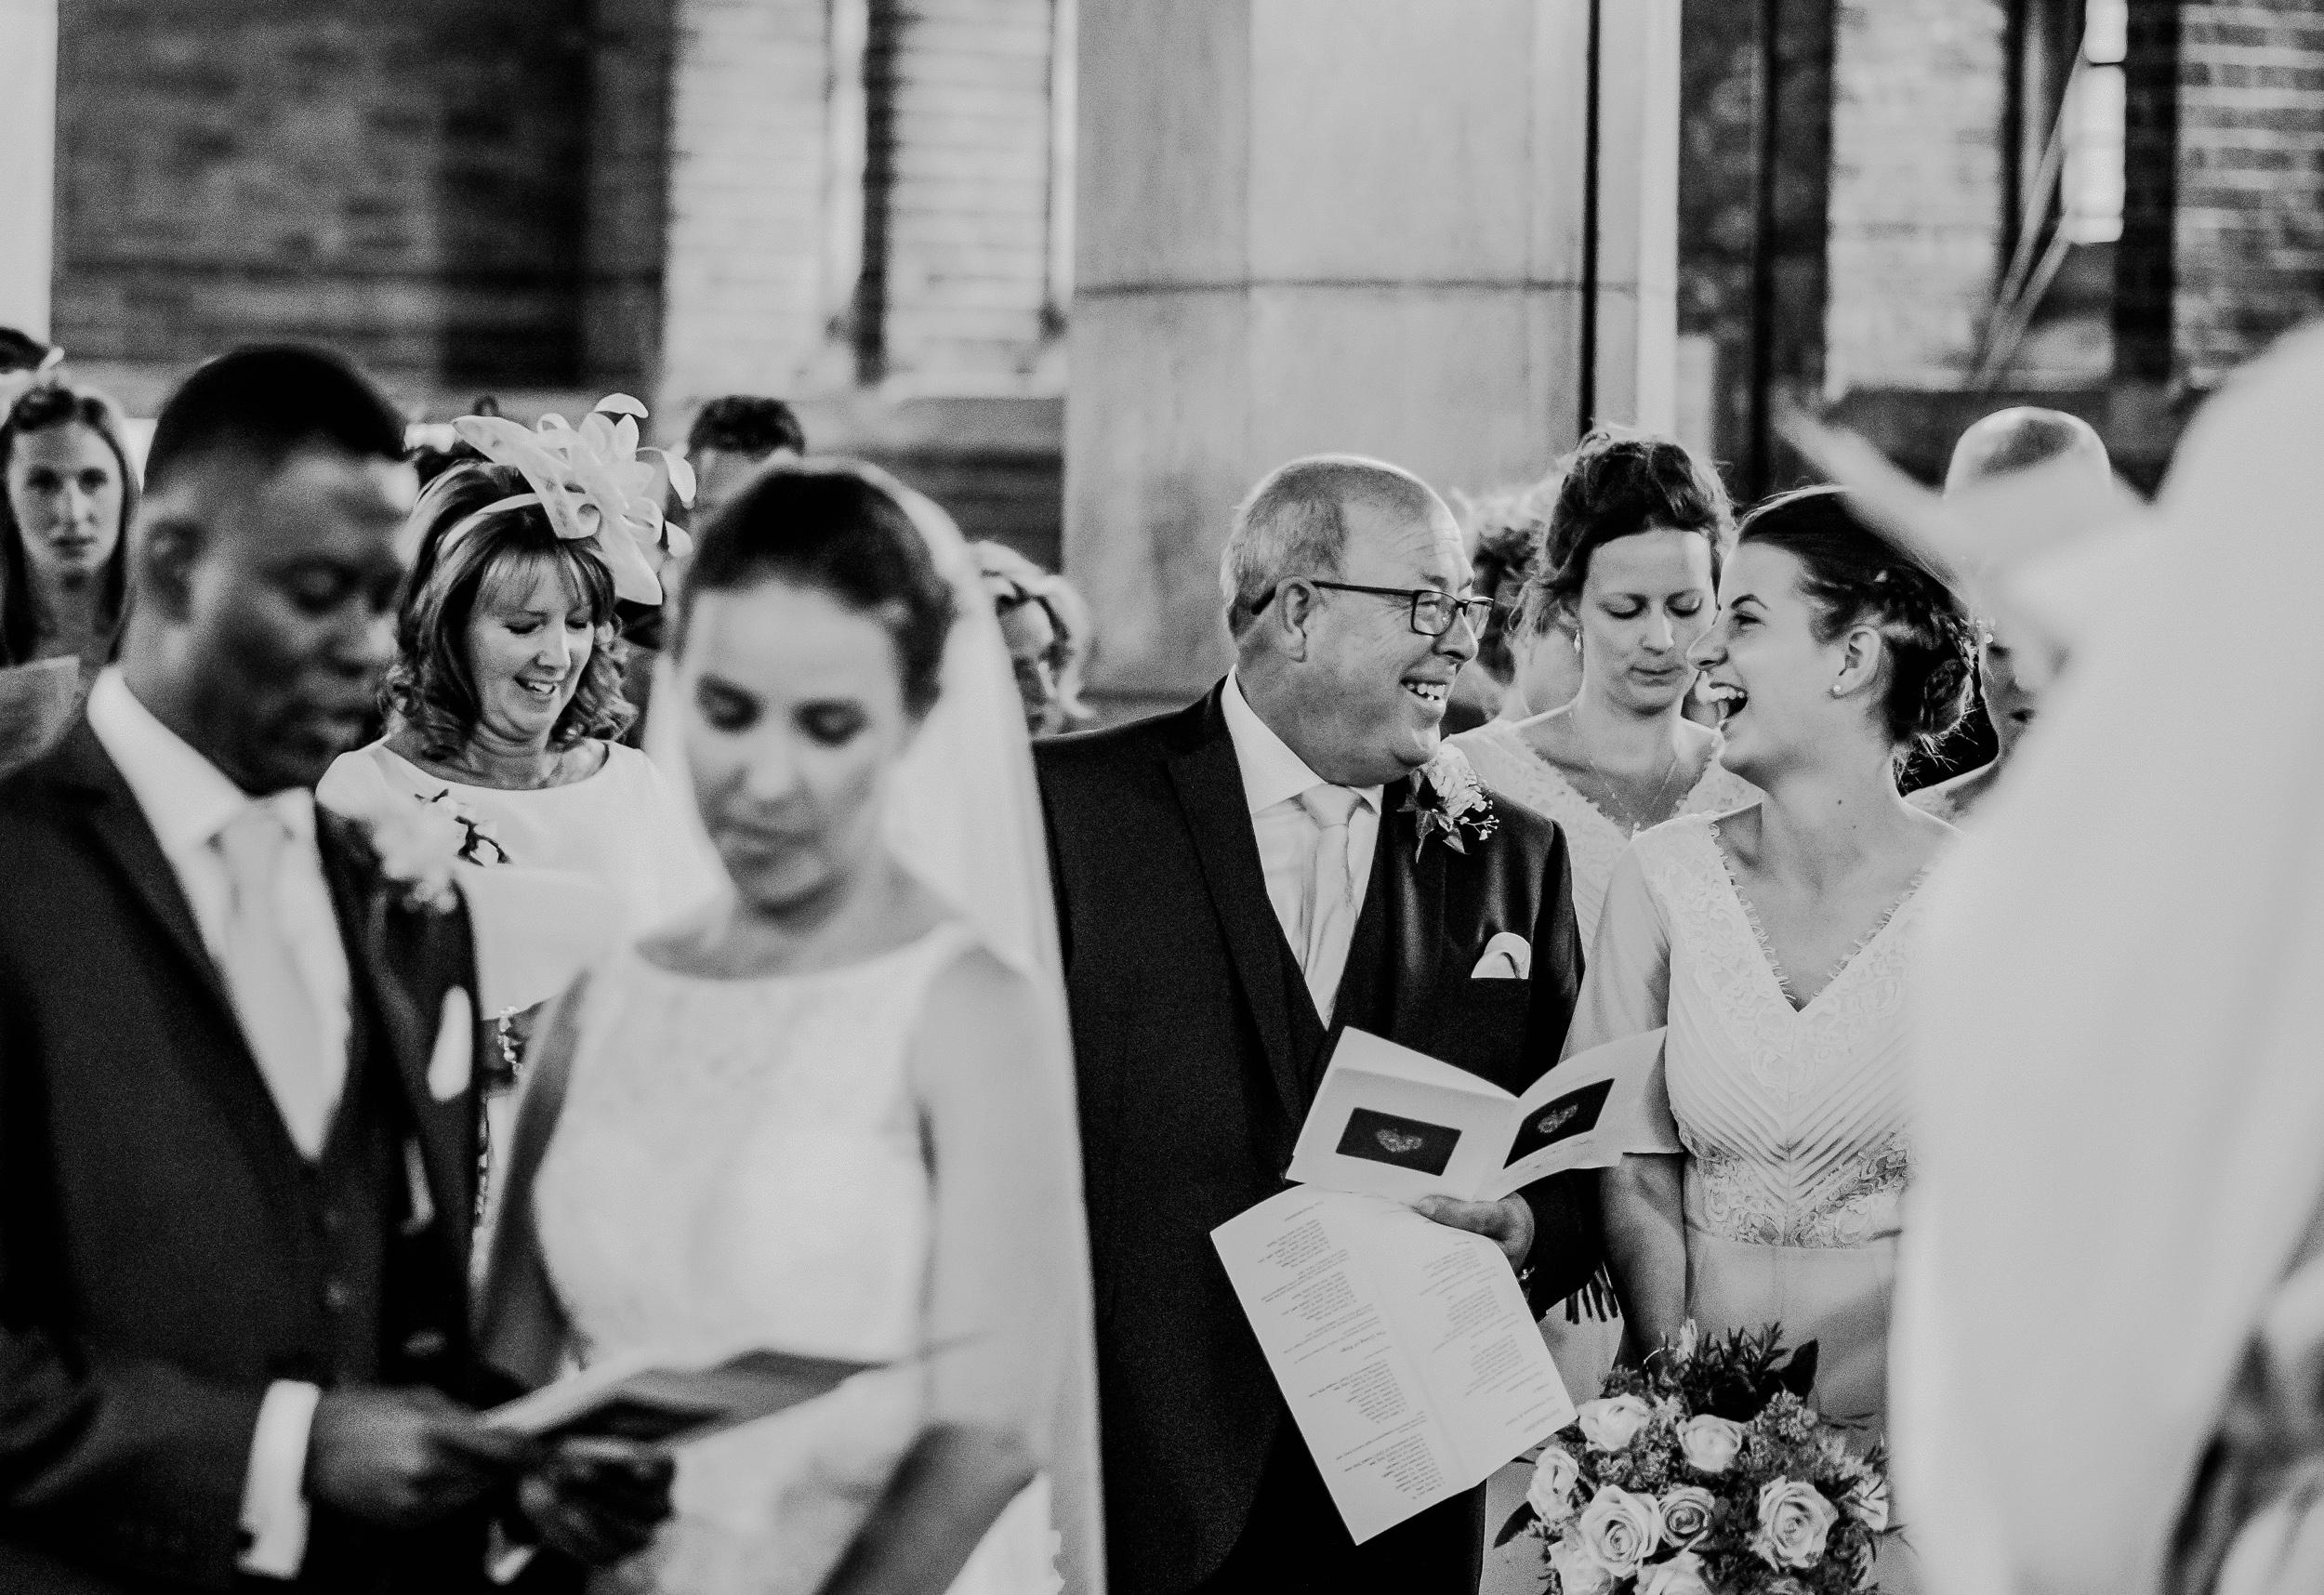 David Scholes Lancashire wedding photography 2016-154.jpg